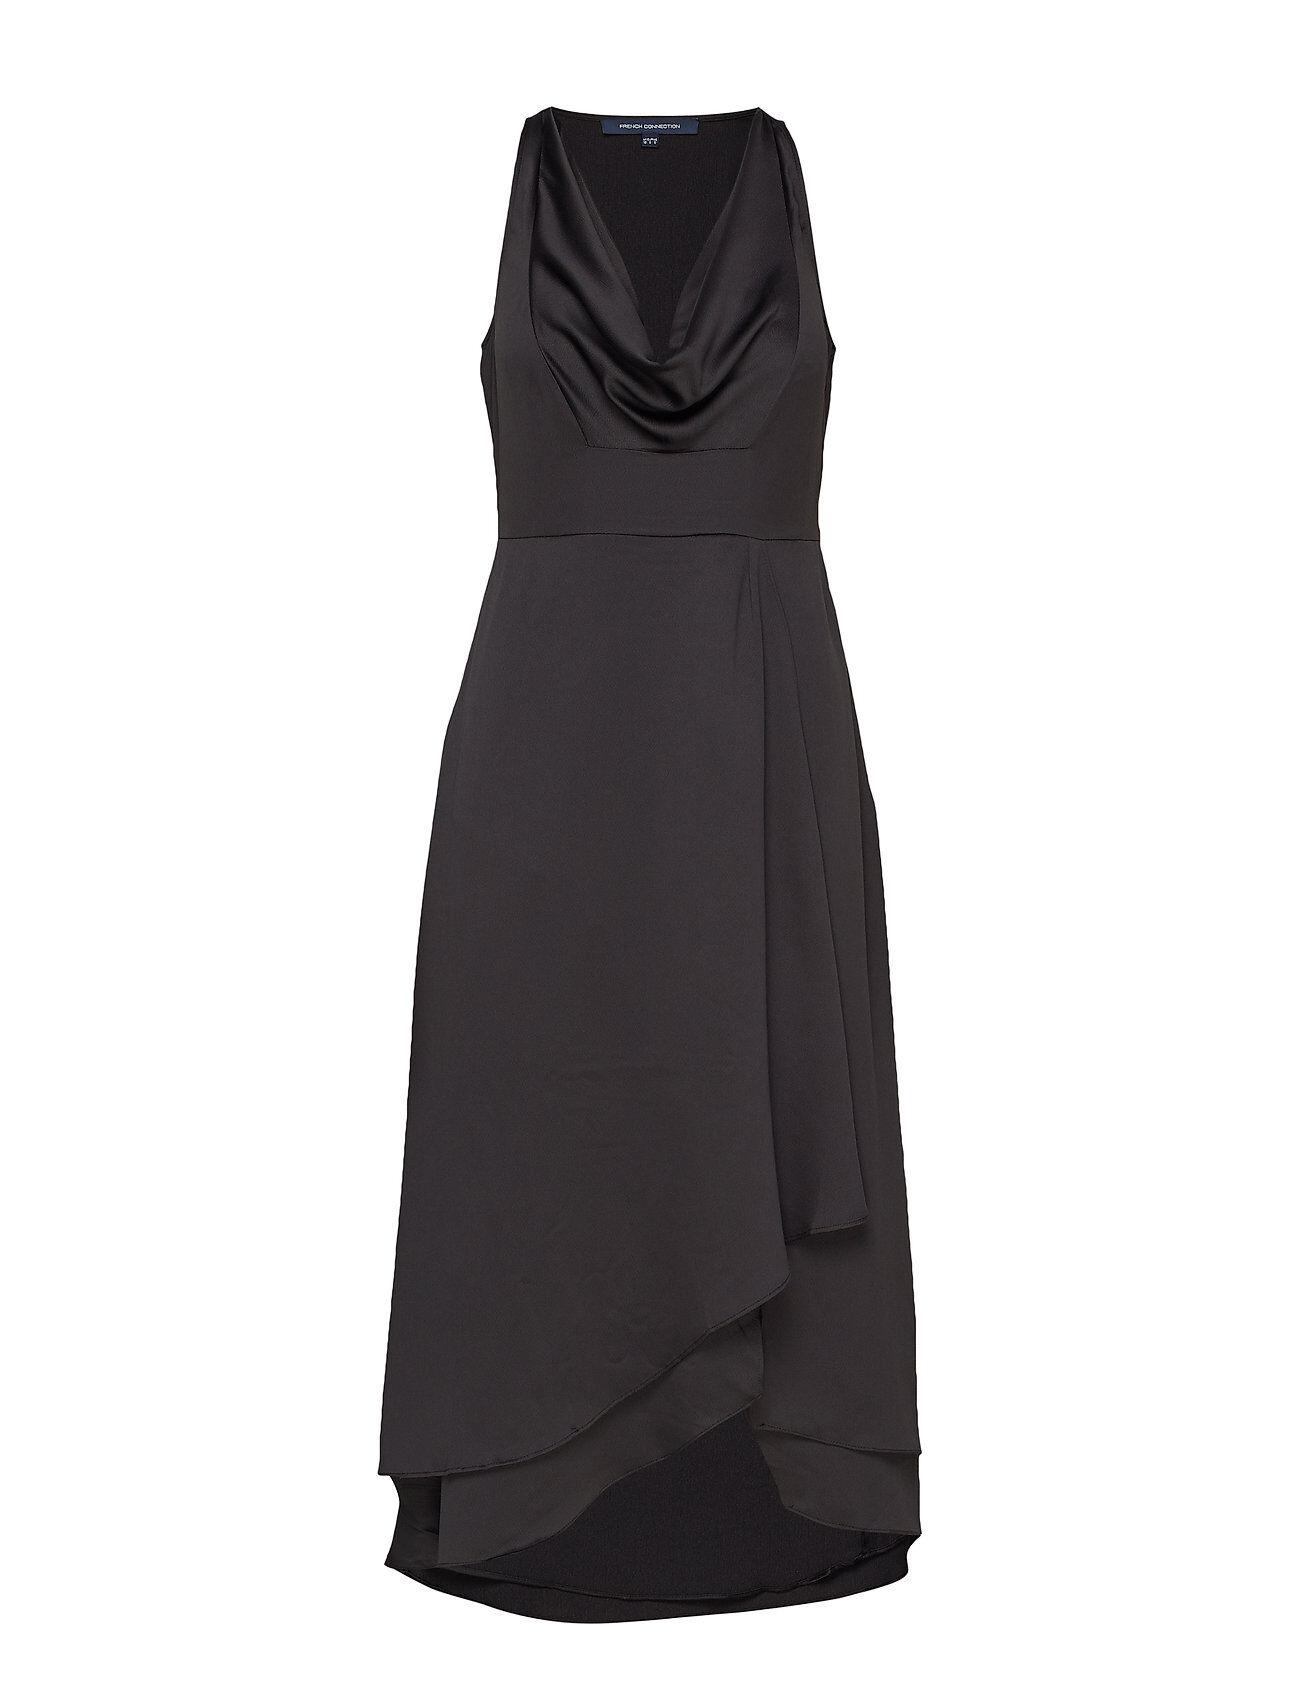 French Connection Alessia Satin Cowl Neck Dress Polvipituinen Mekko Musta